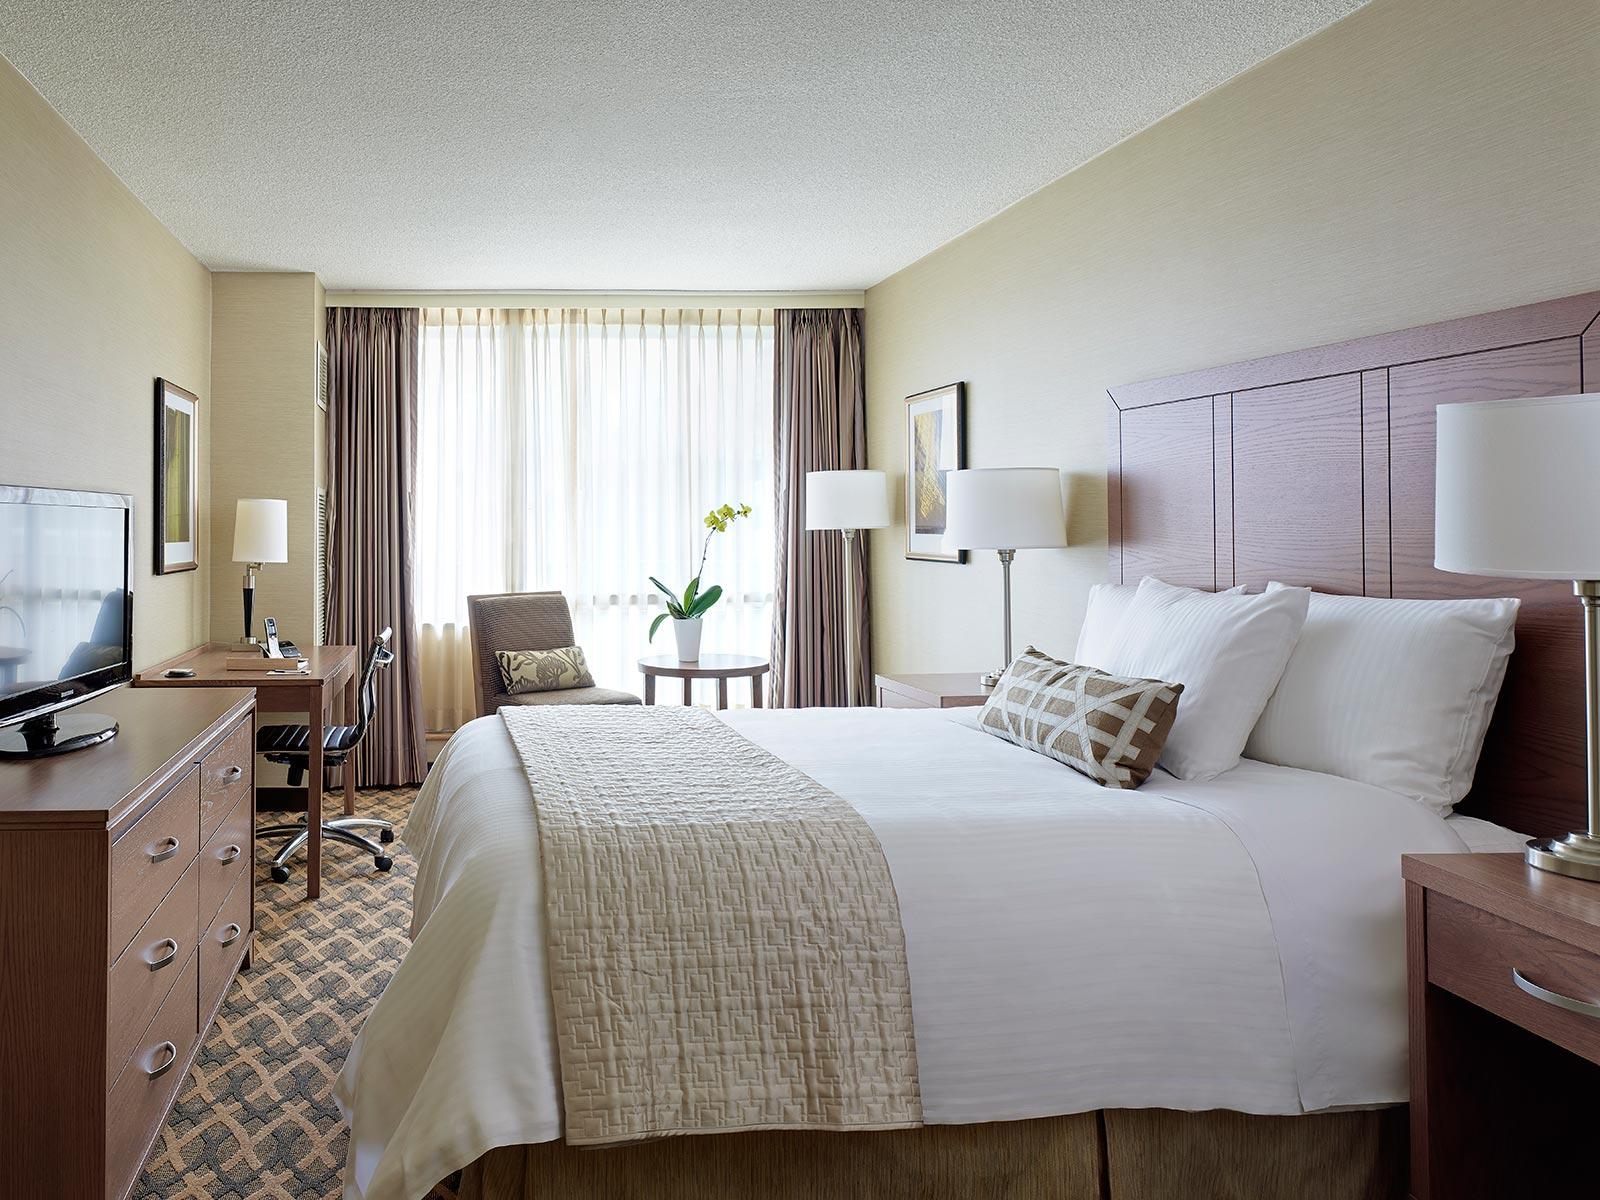 One Bedroom Hotel Suite With Balcony Chelsea Hotel Toronto